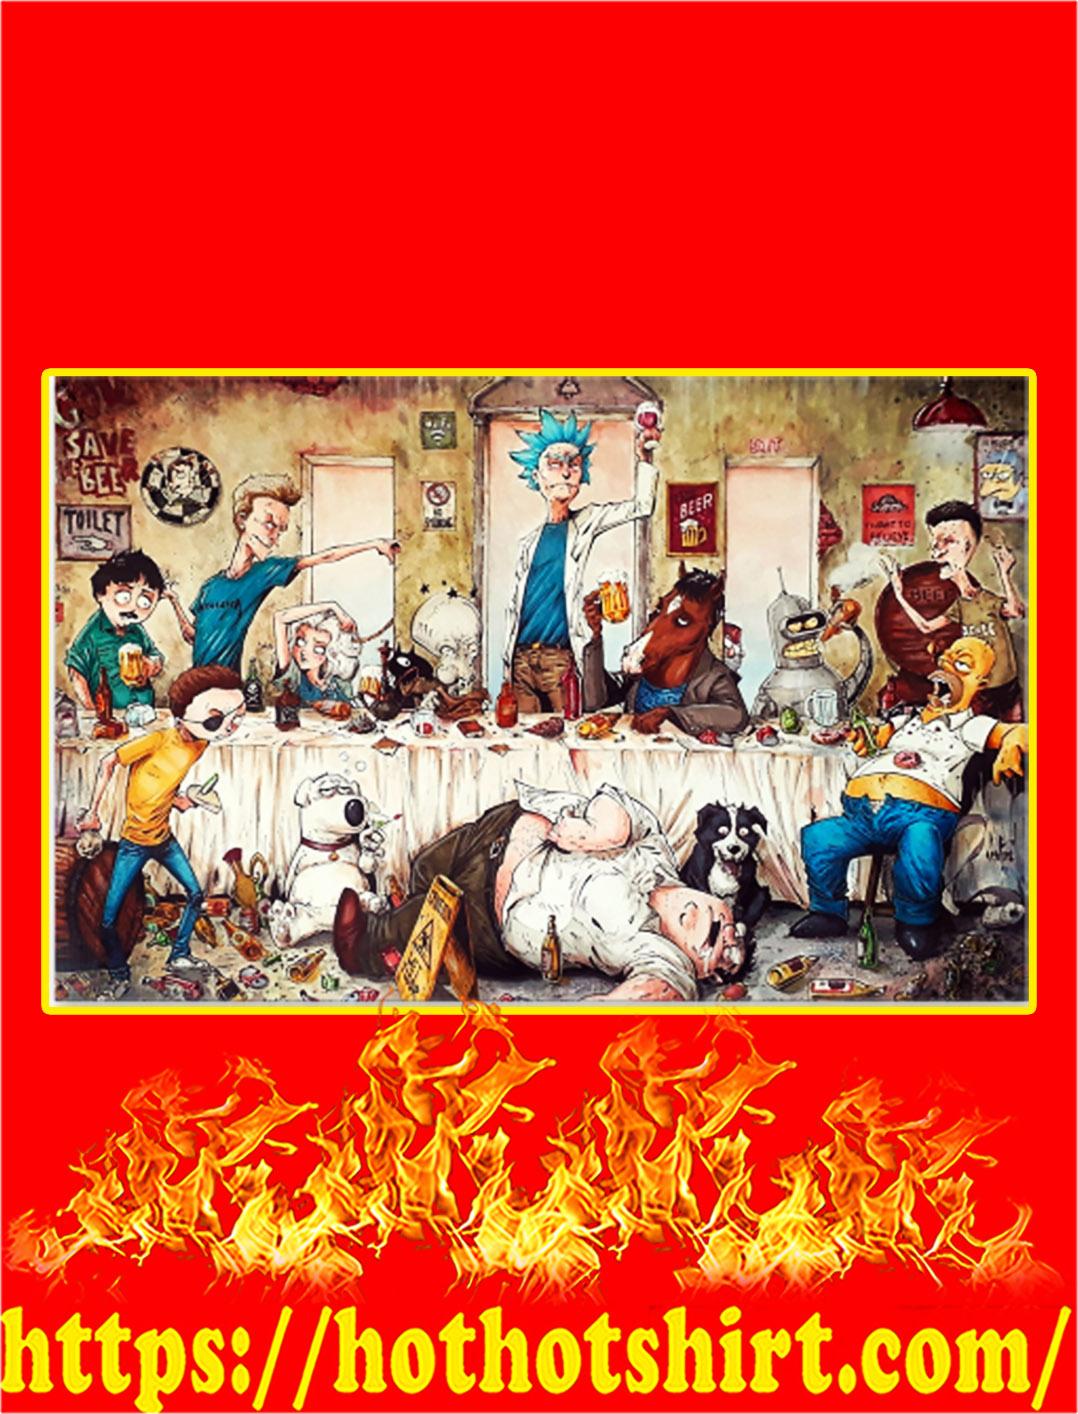 Adult cartoons art work by marcelo ventura poster - A2